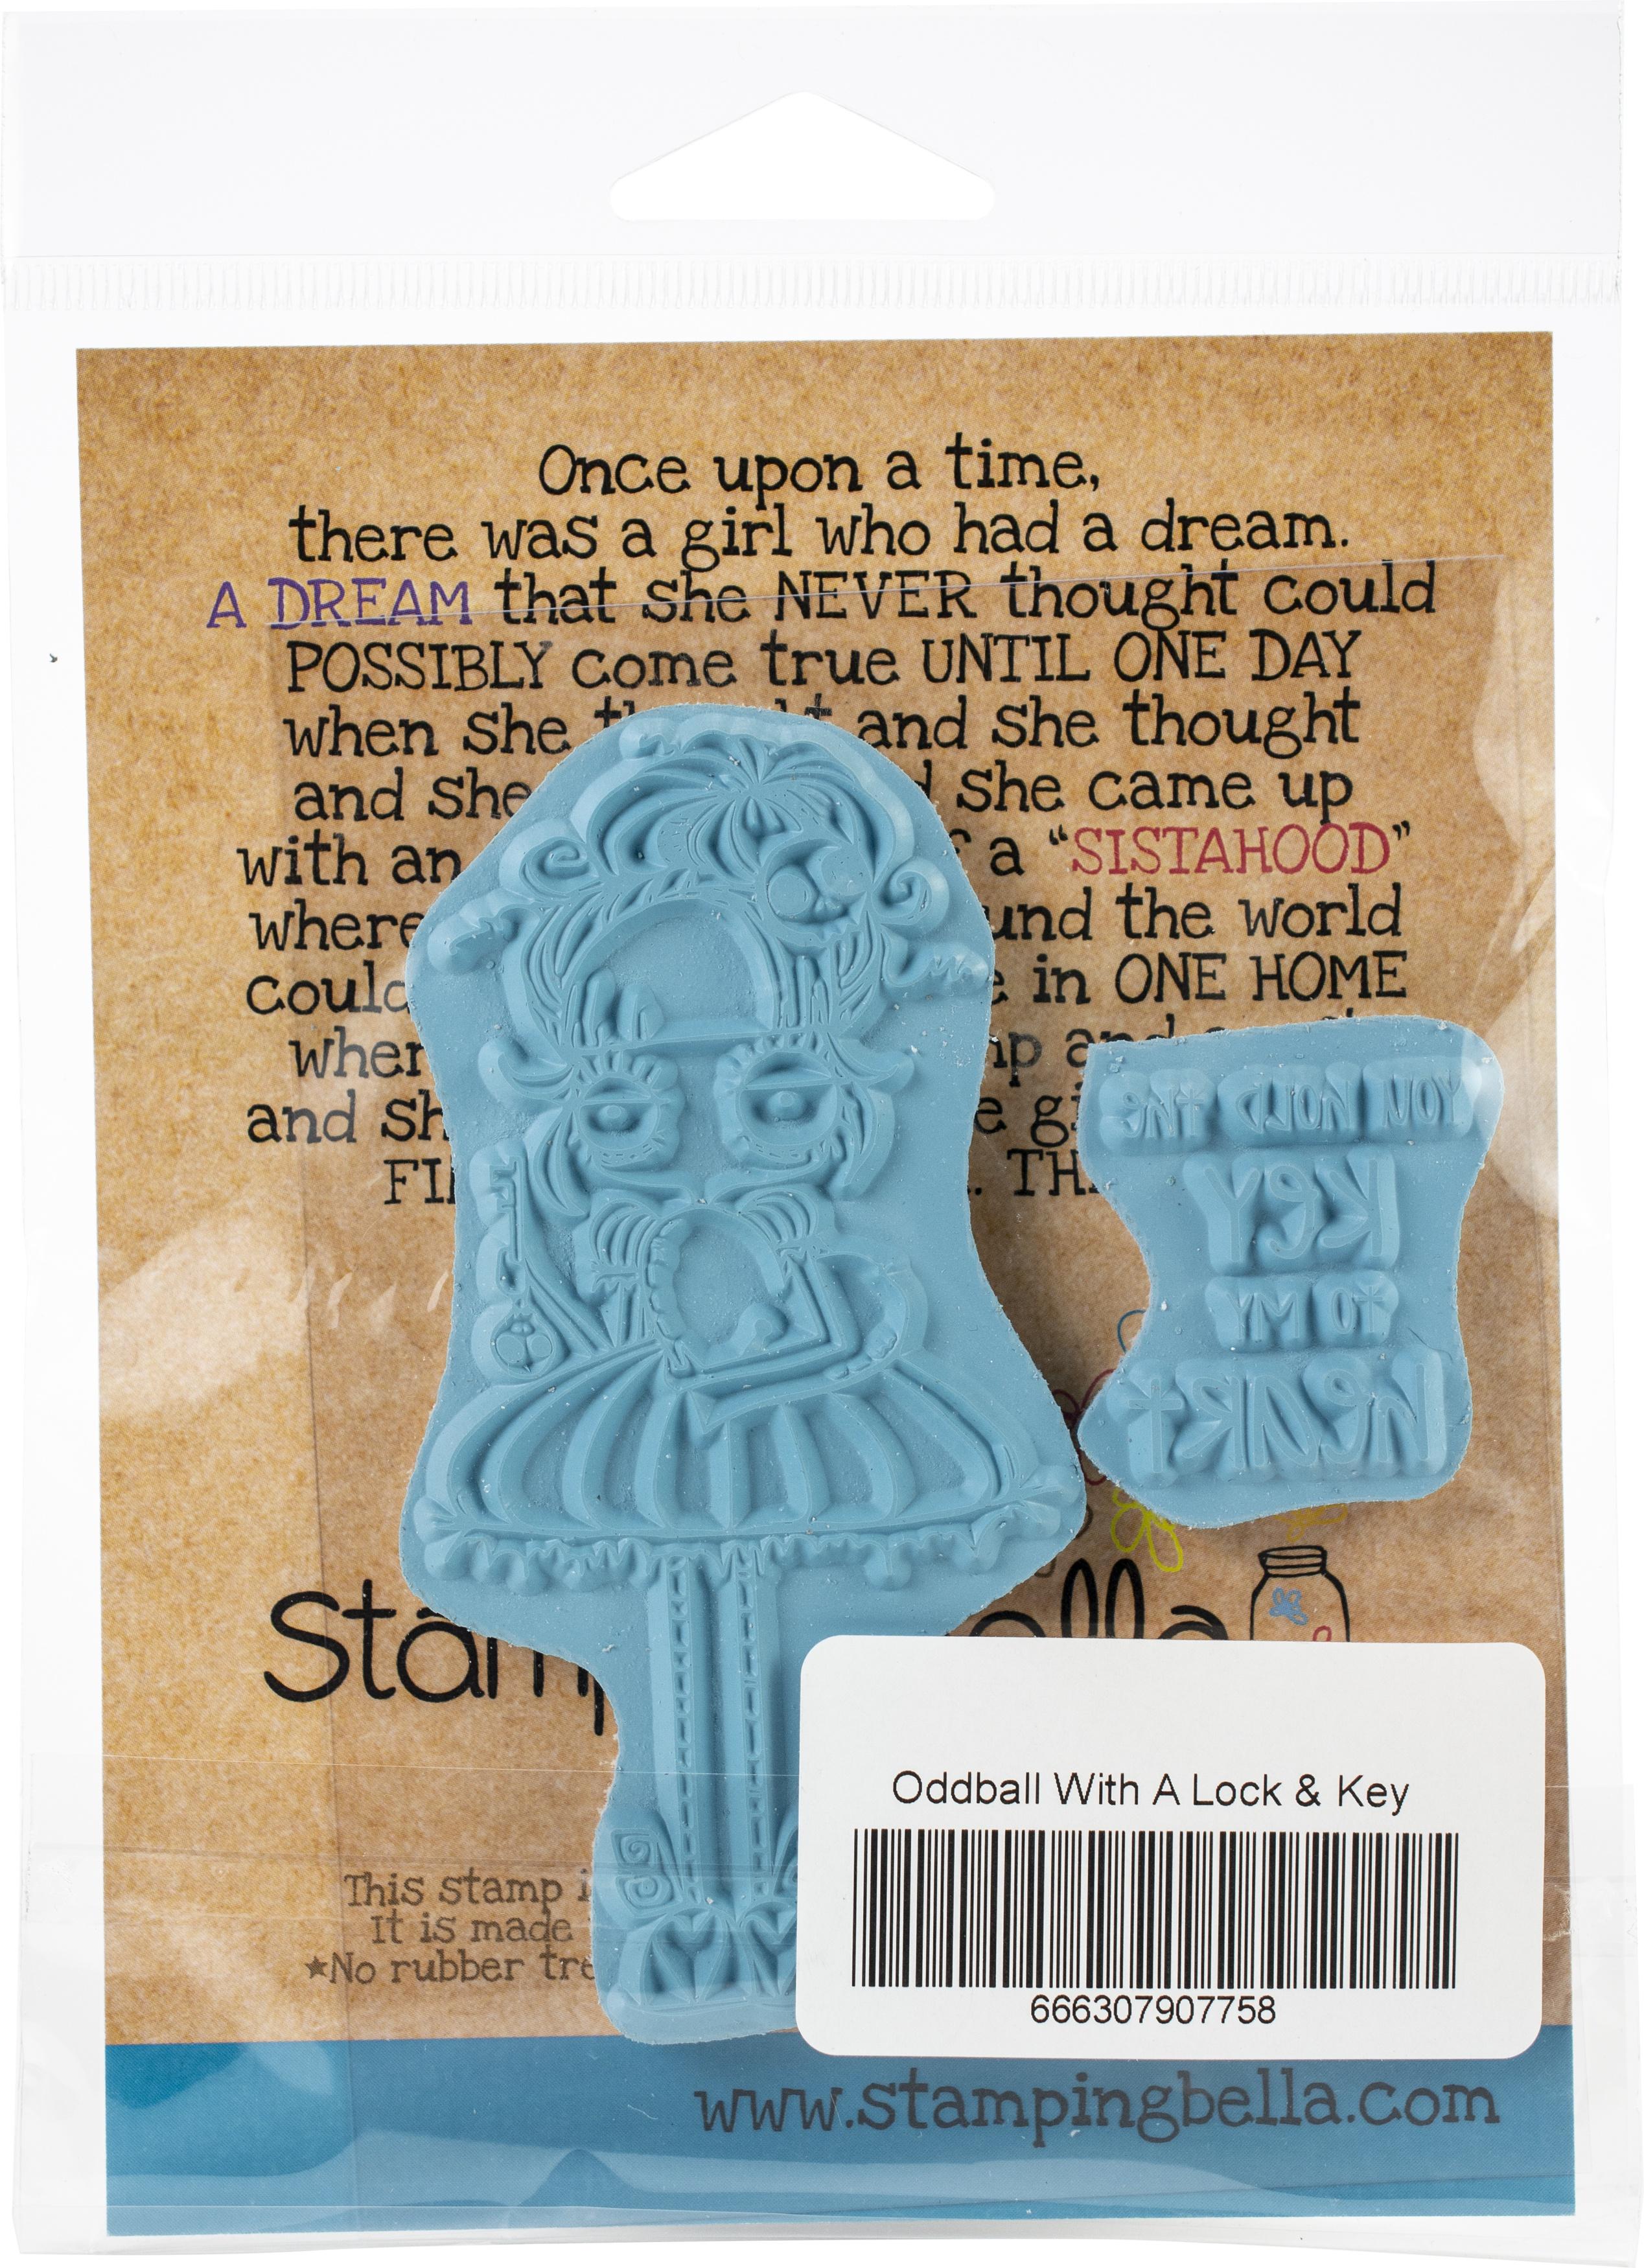 Oddball With A Lock & Key Stamp Set